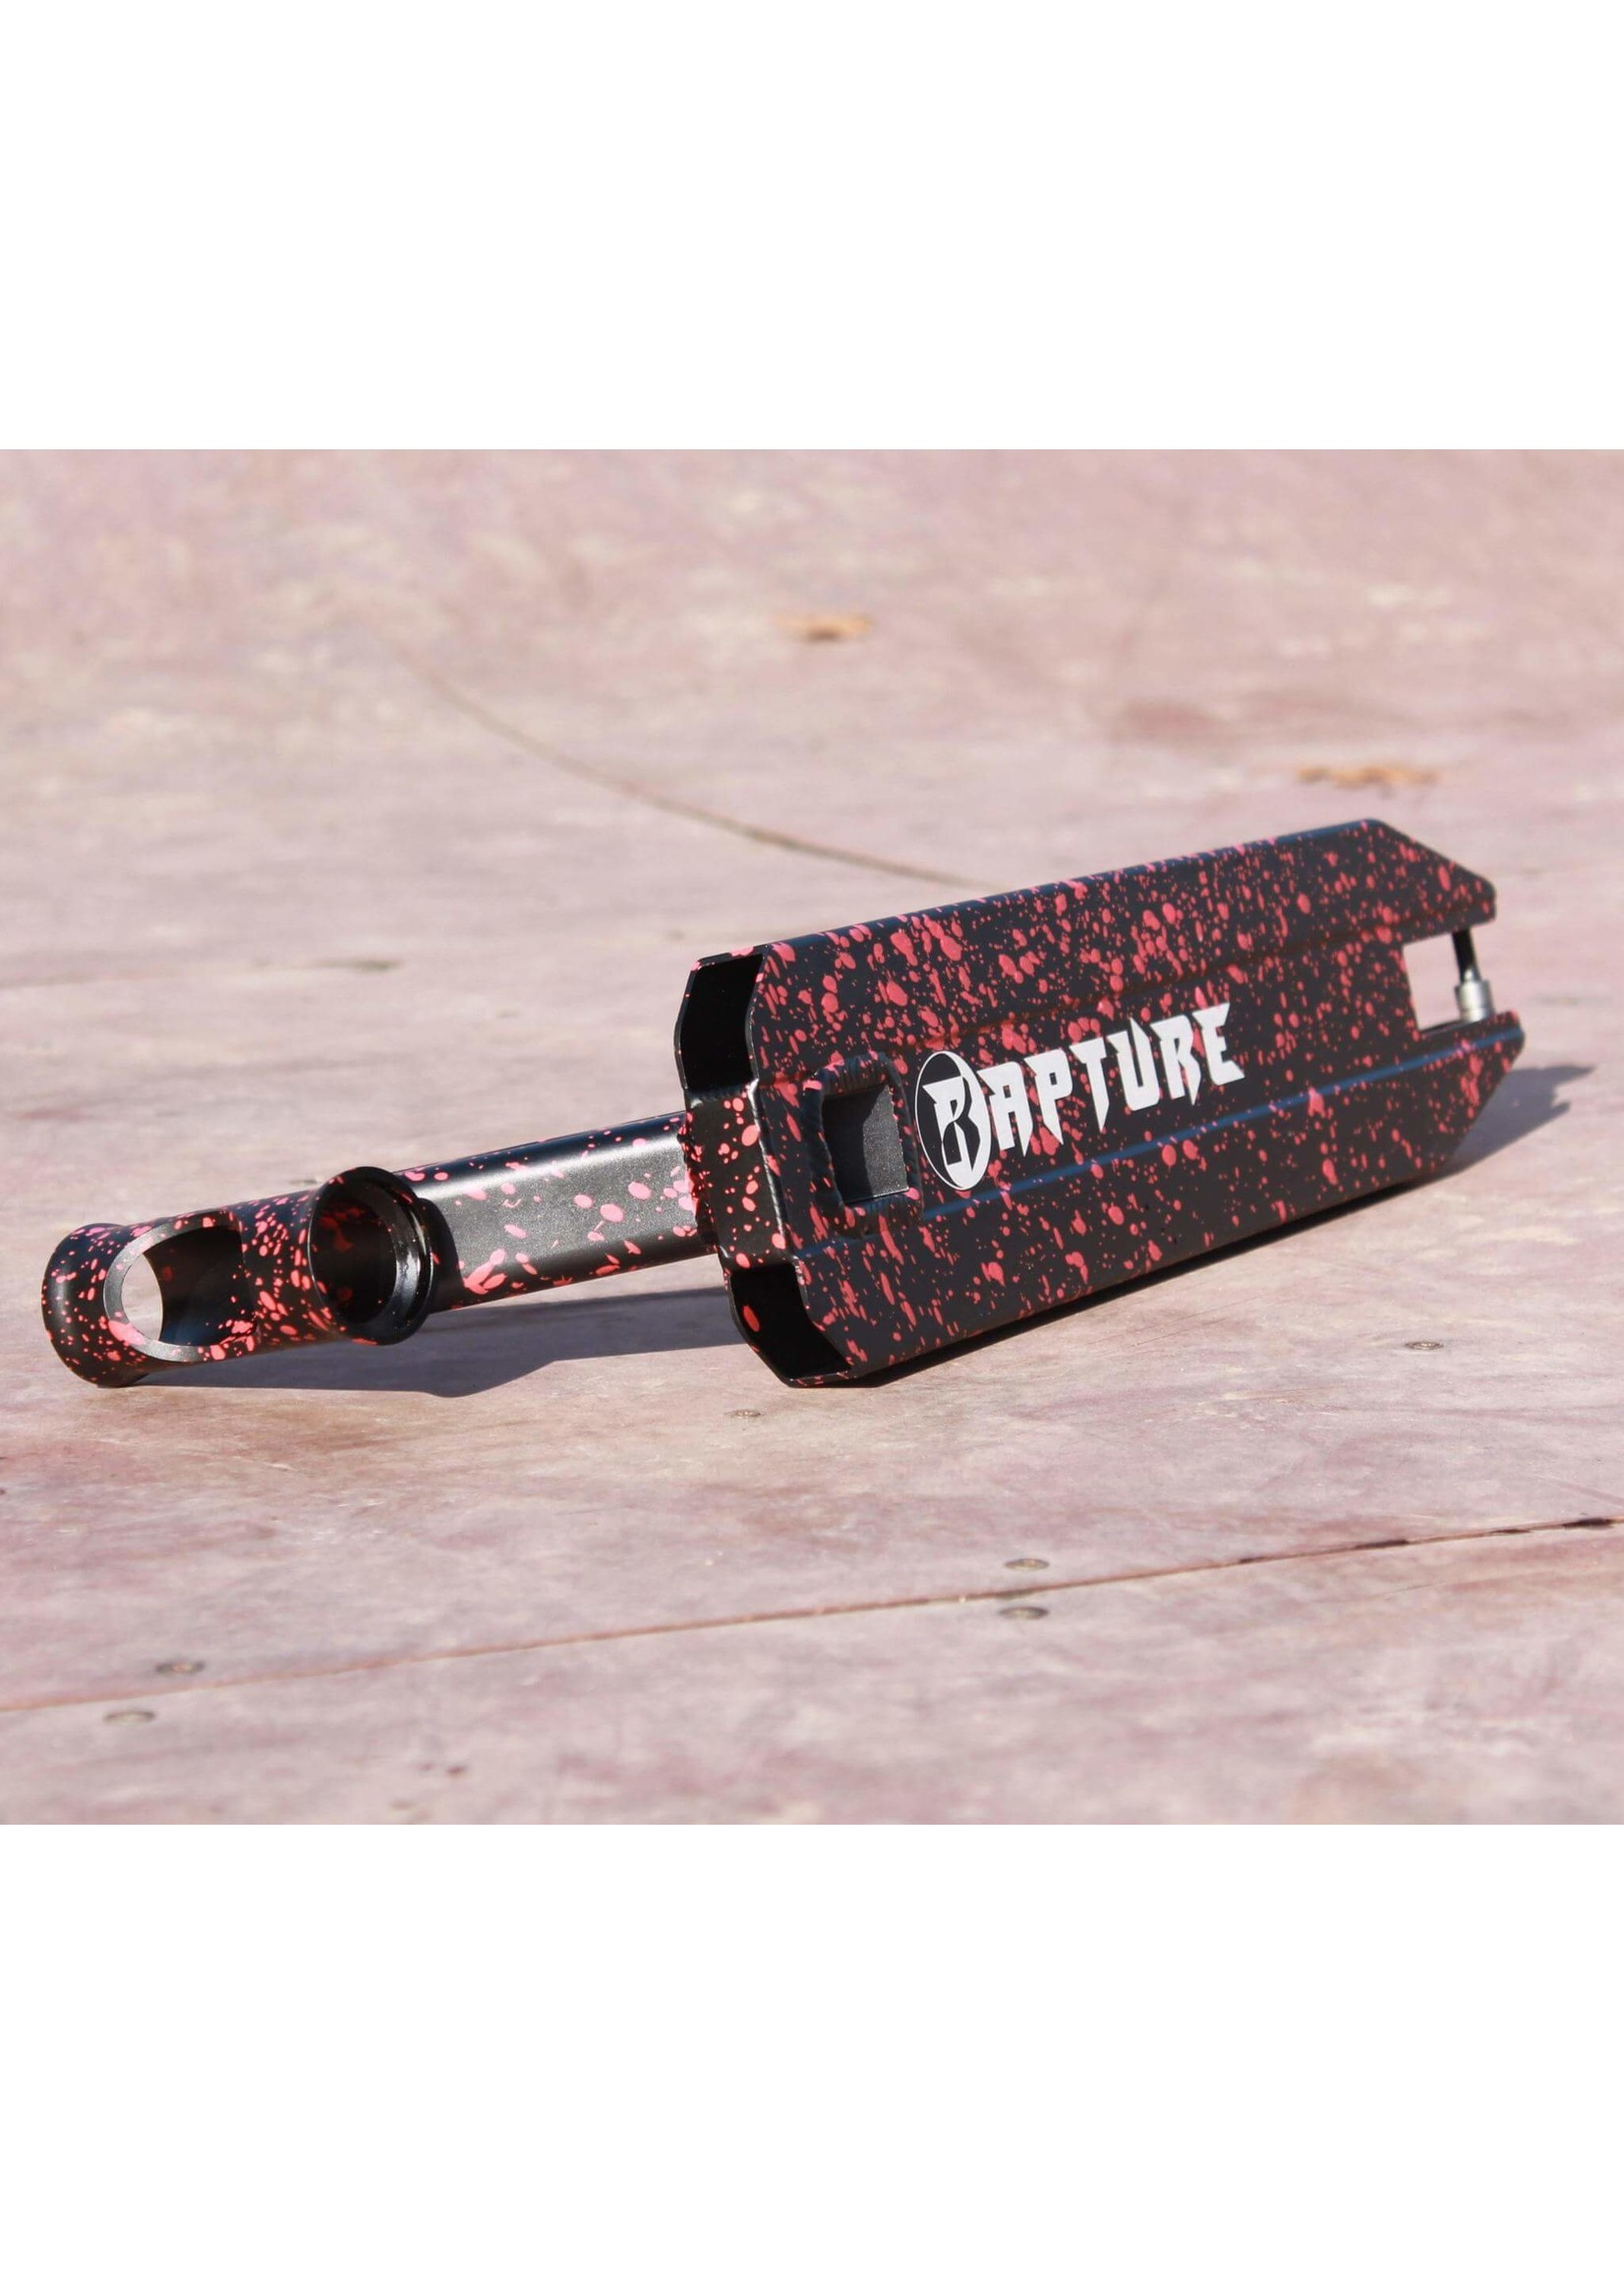 Rapture Rapture - Spyder Deck - 19.5